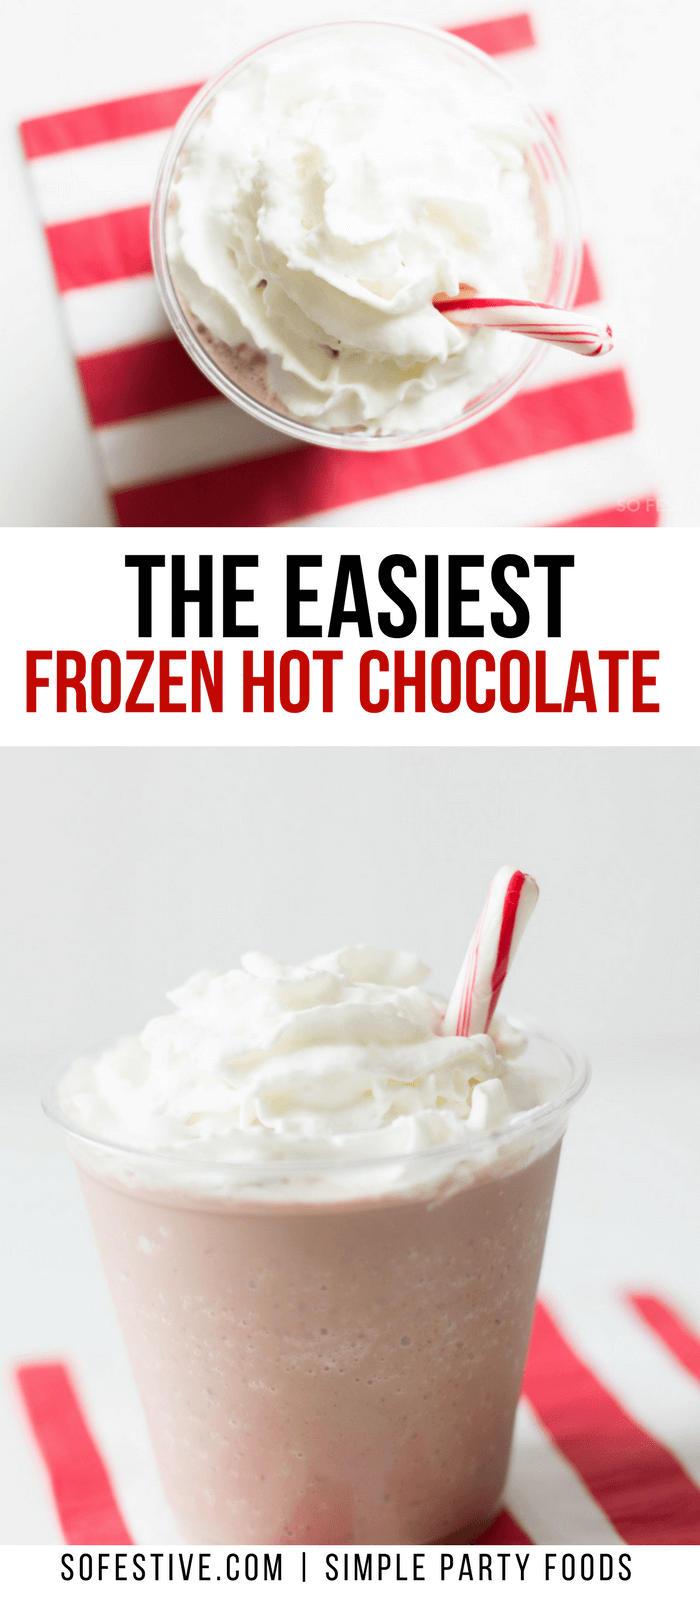 Super Easy Frozen Hot Chocolate Drink Recipe | So Festive! #hotchocolaterecipe